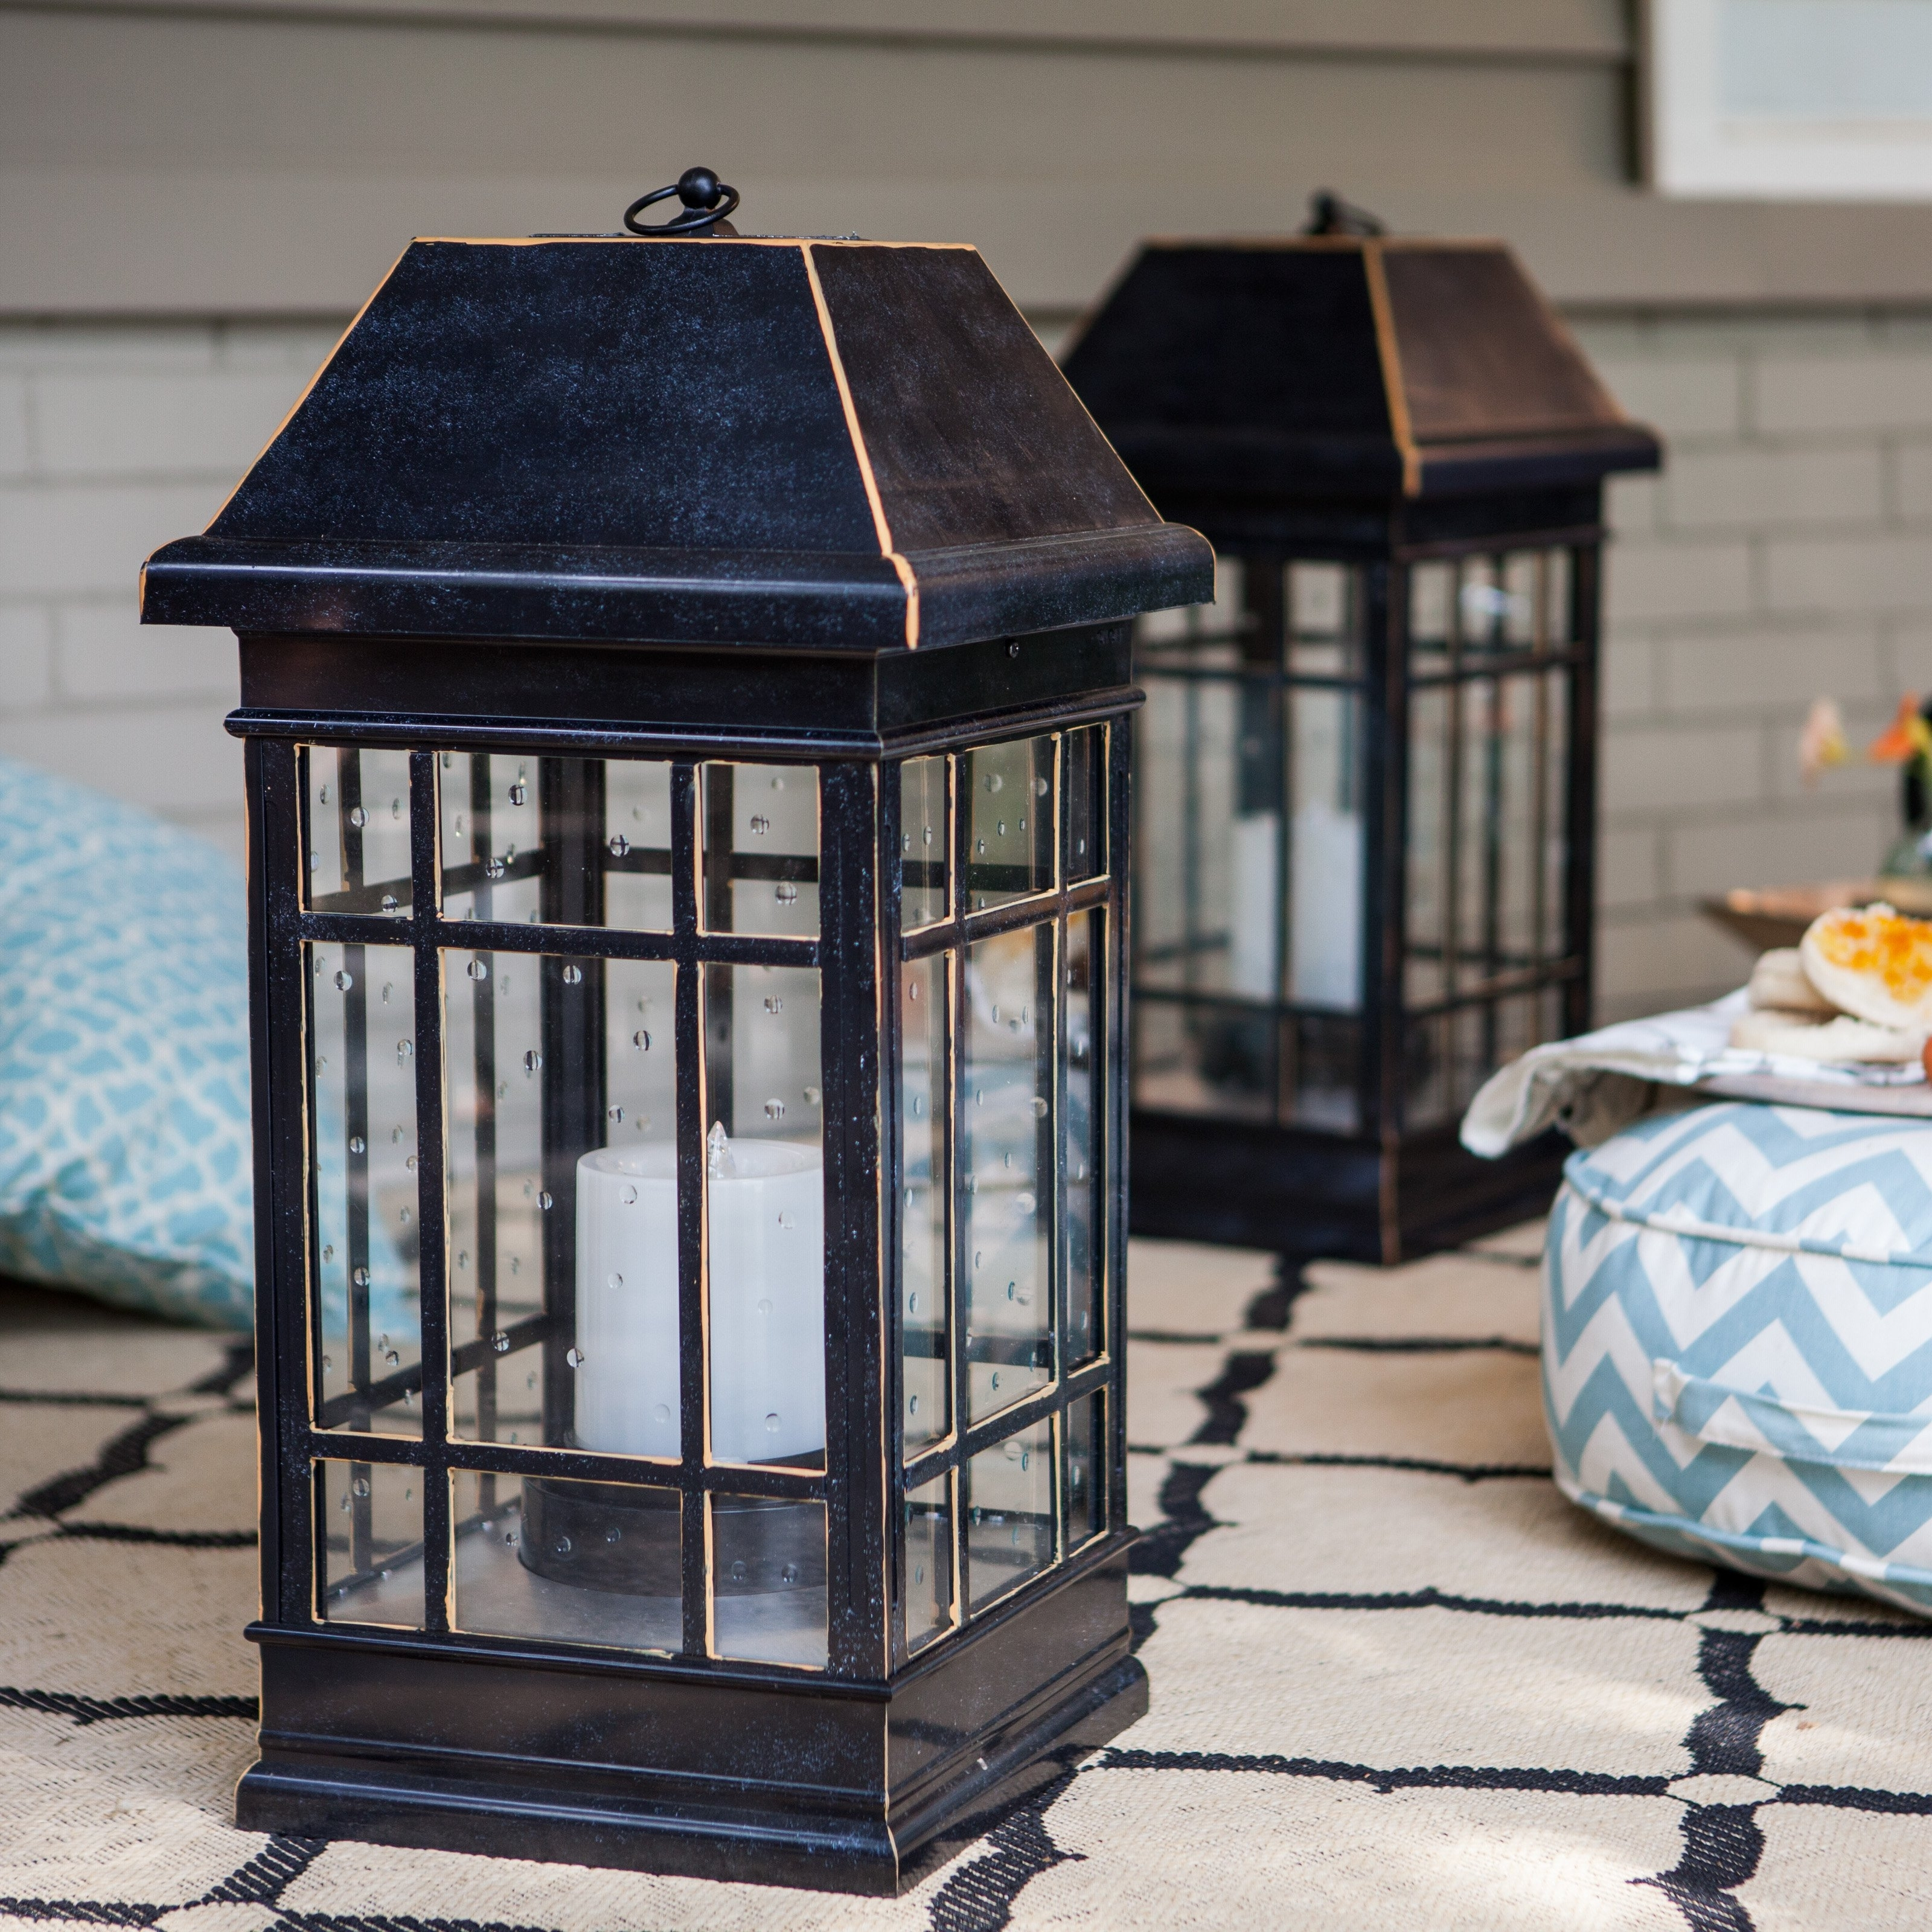 Smart Solar San Rafael Estate Solar Mission Lantern   Hayneedle intended for Outdoor Decorative Lanterns (Image 18 of 20)